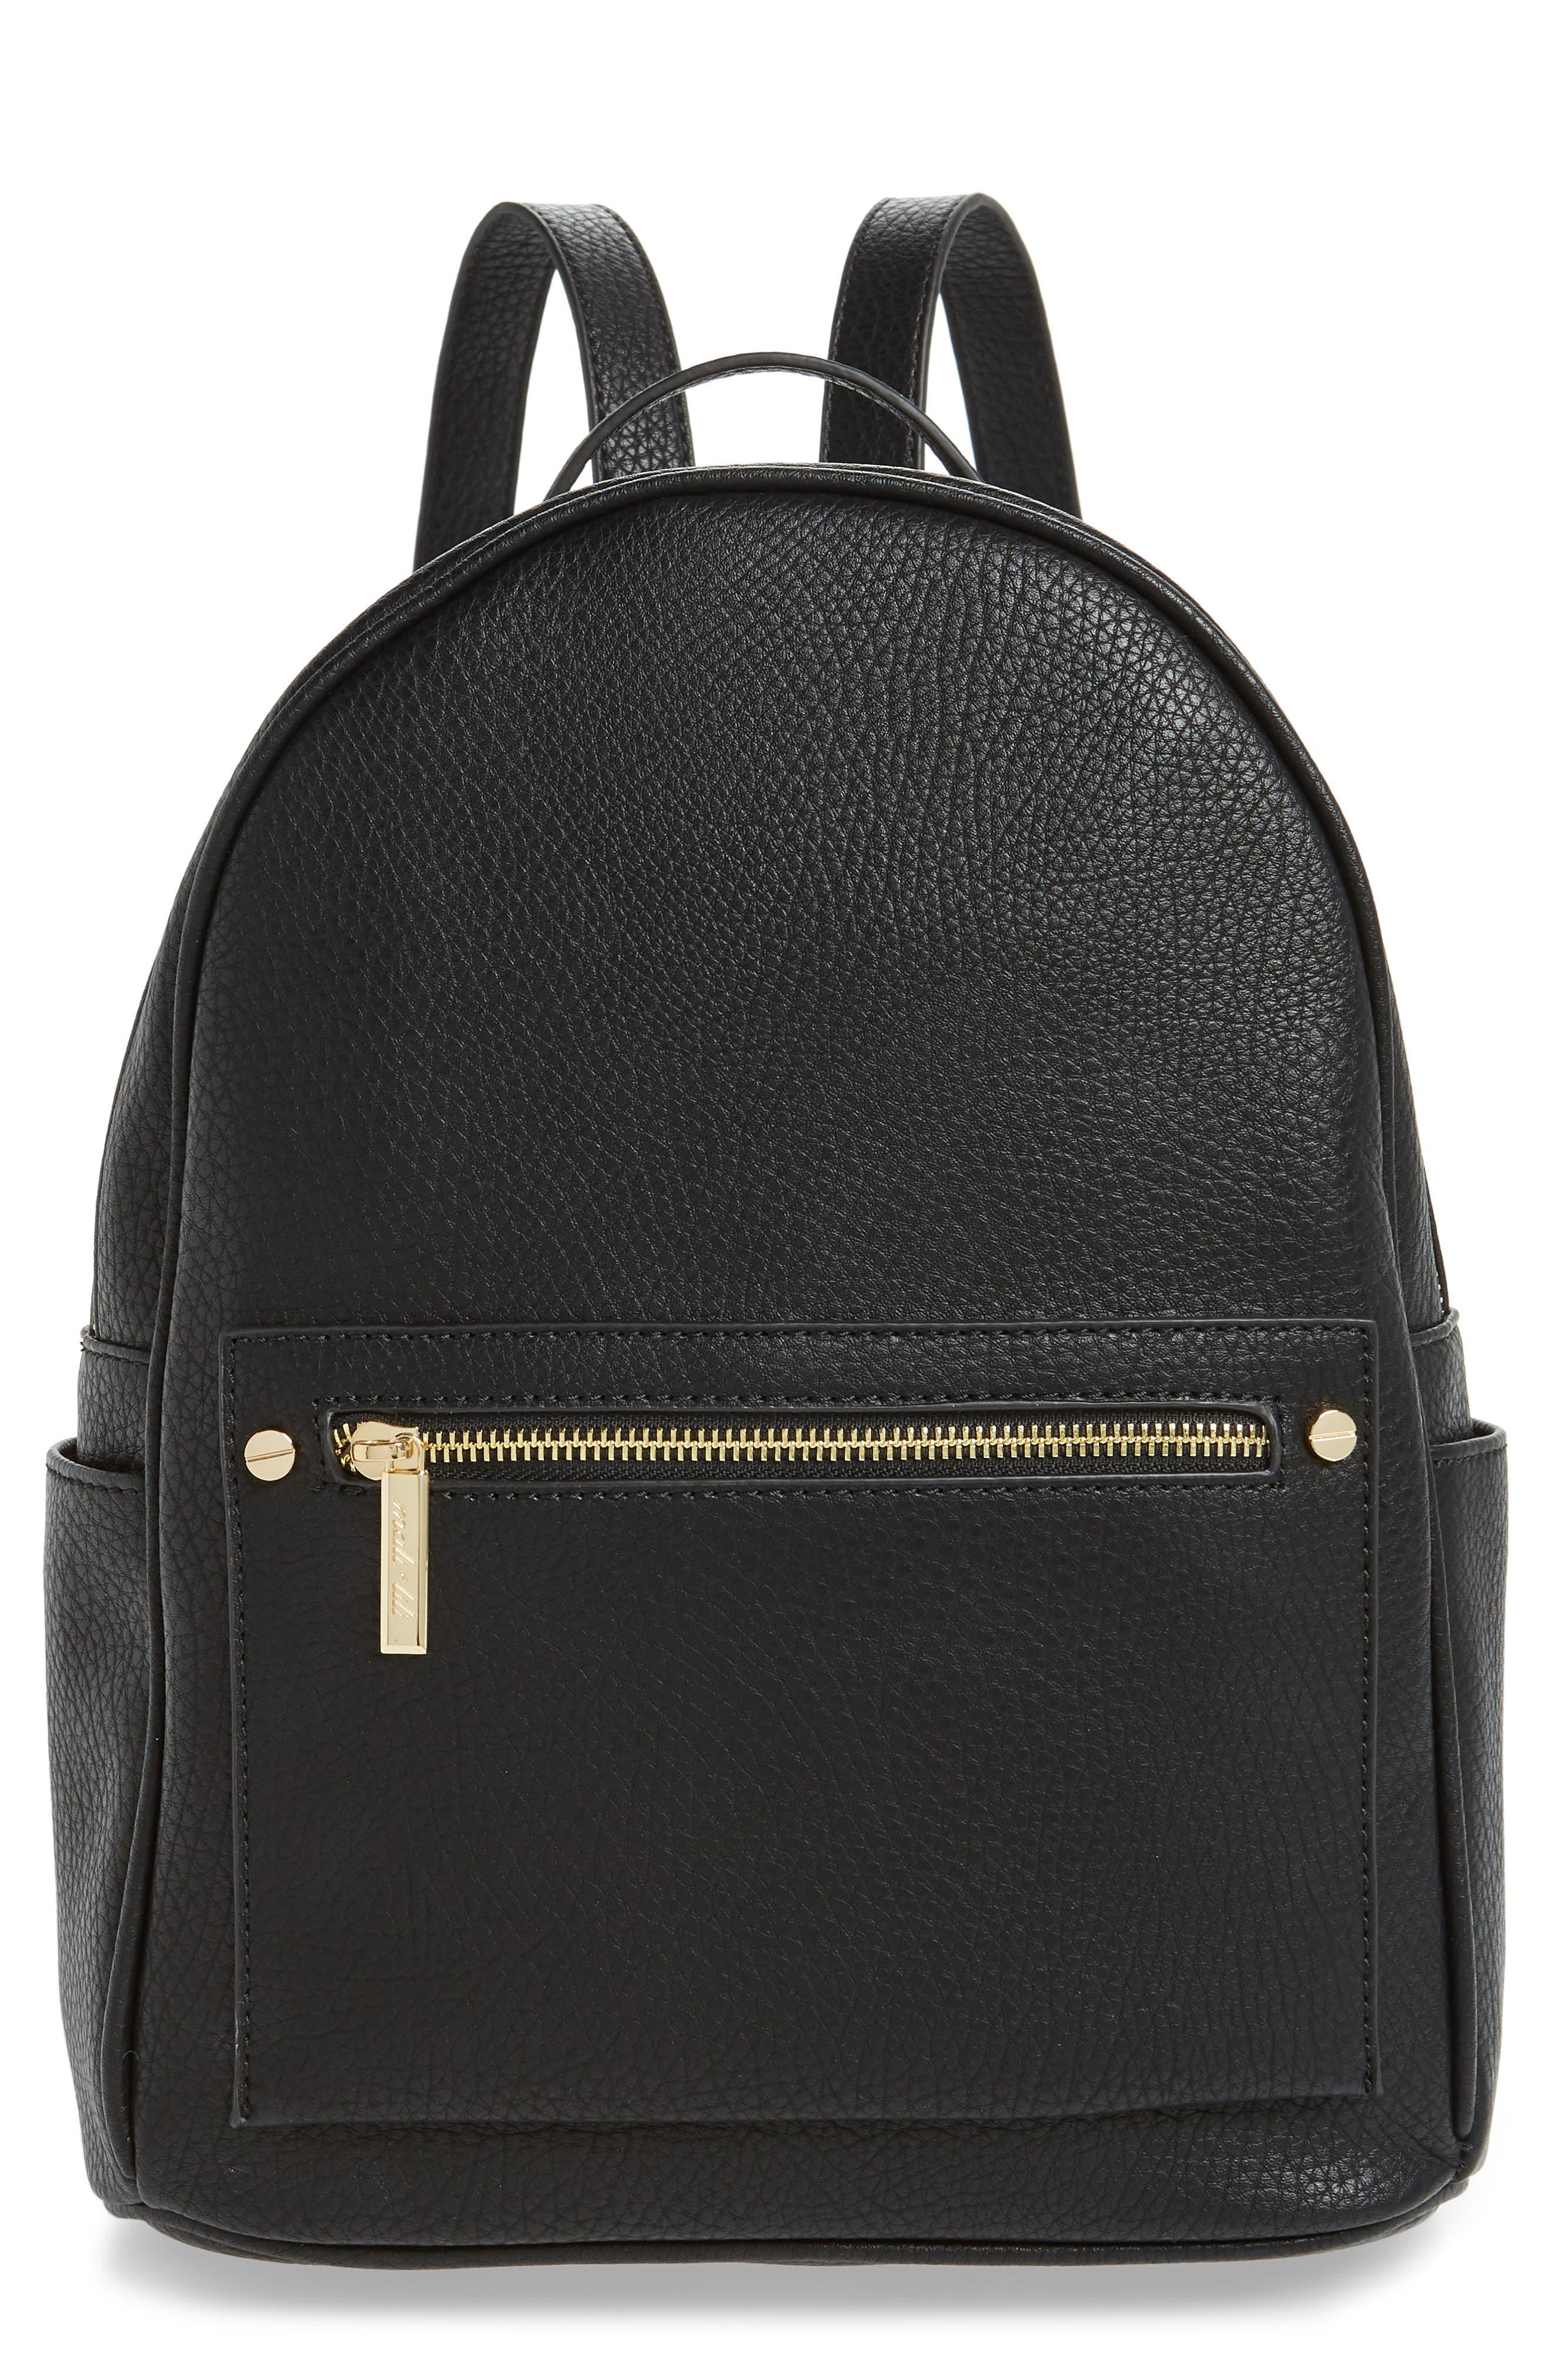 MALI + LILI Addie Vegan Leather Backpack, Main, color, BLACK